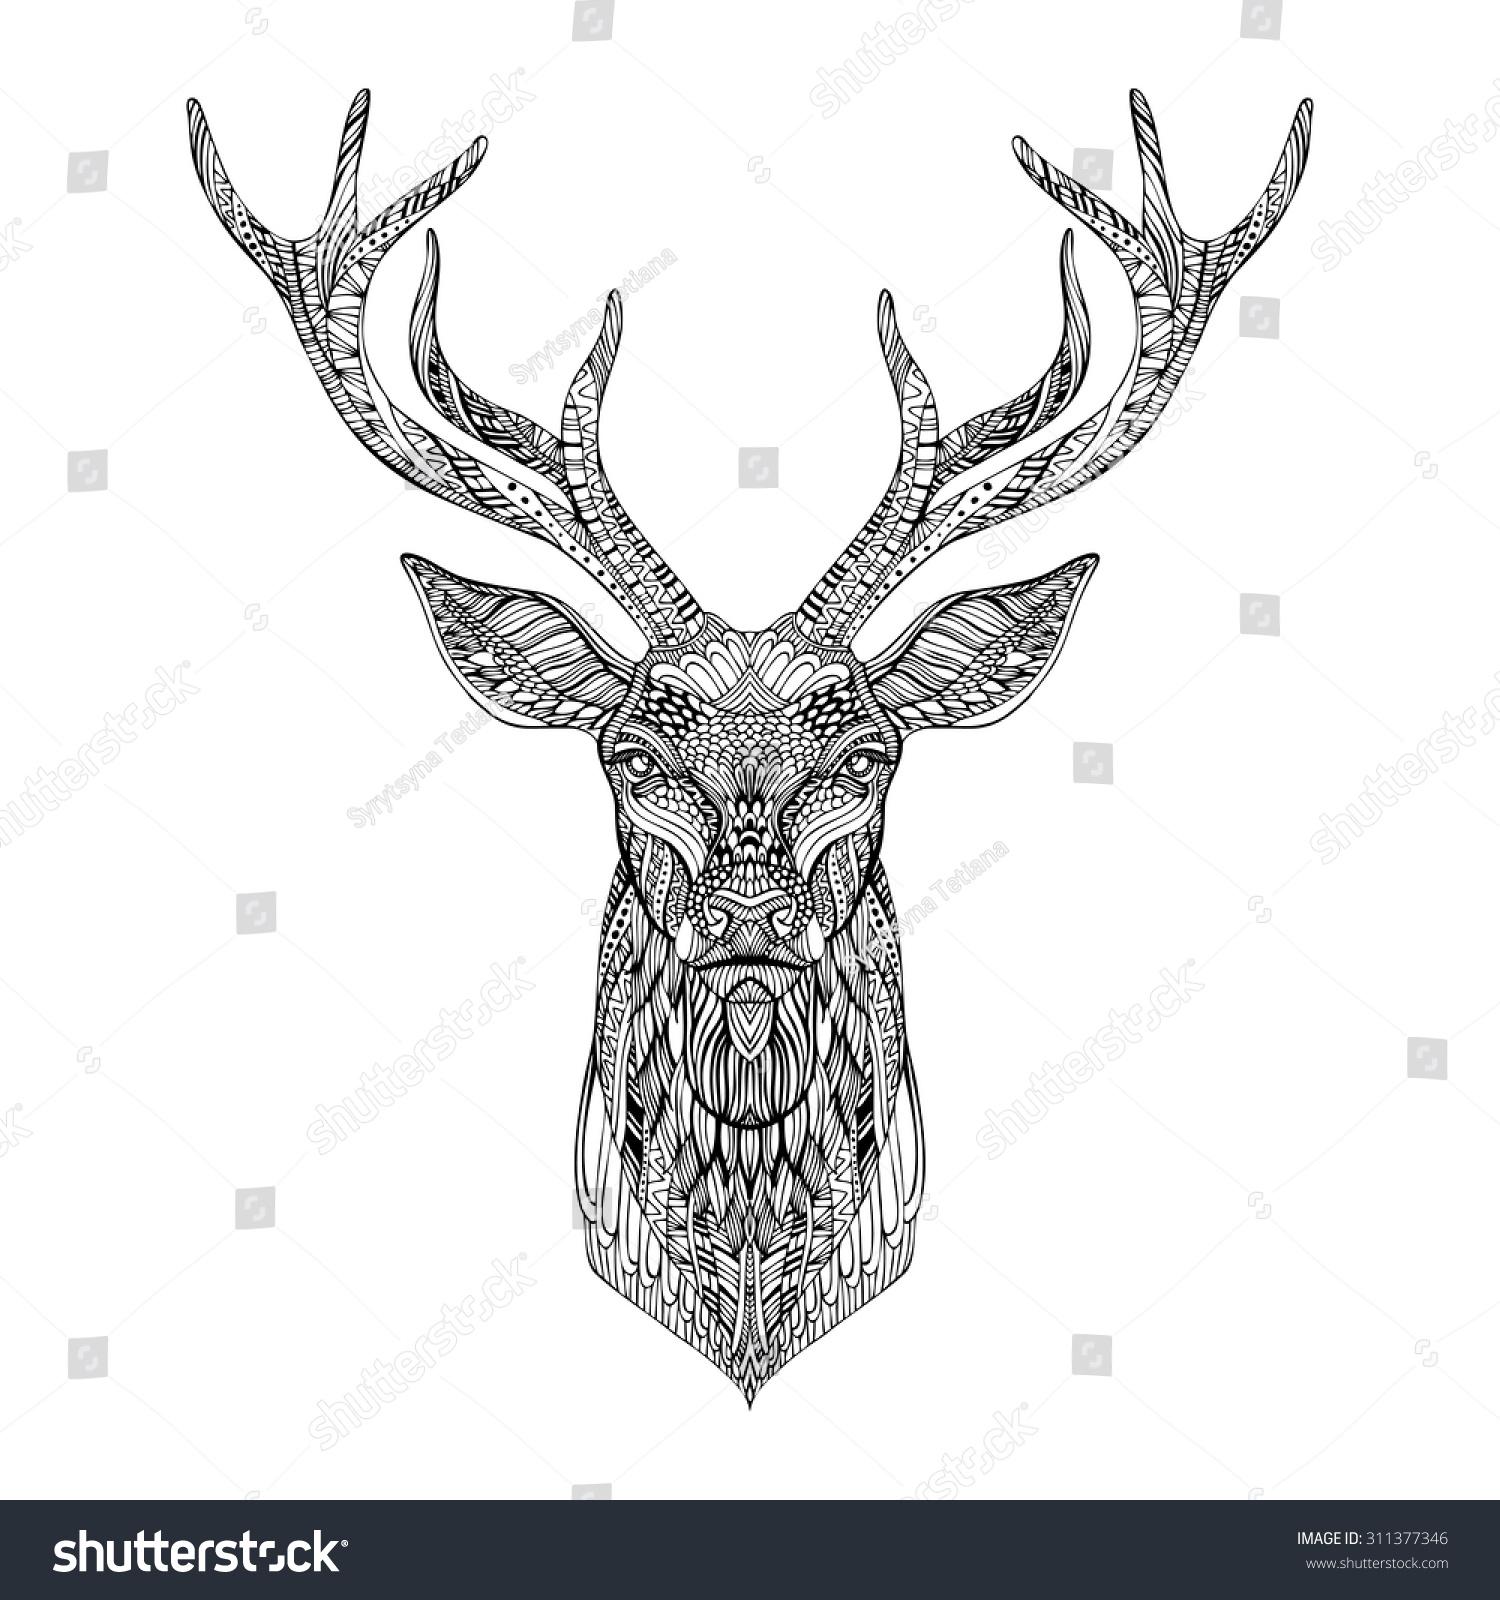 deer head stylized zentangle style tribal stock vector 311377346 shutterstock. Black Bedroom Furniture Sets. Home Design Ideas